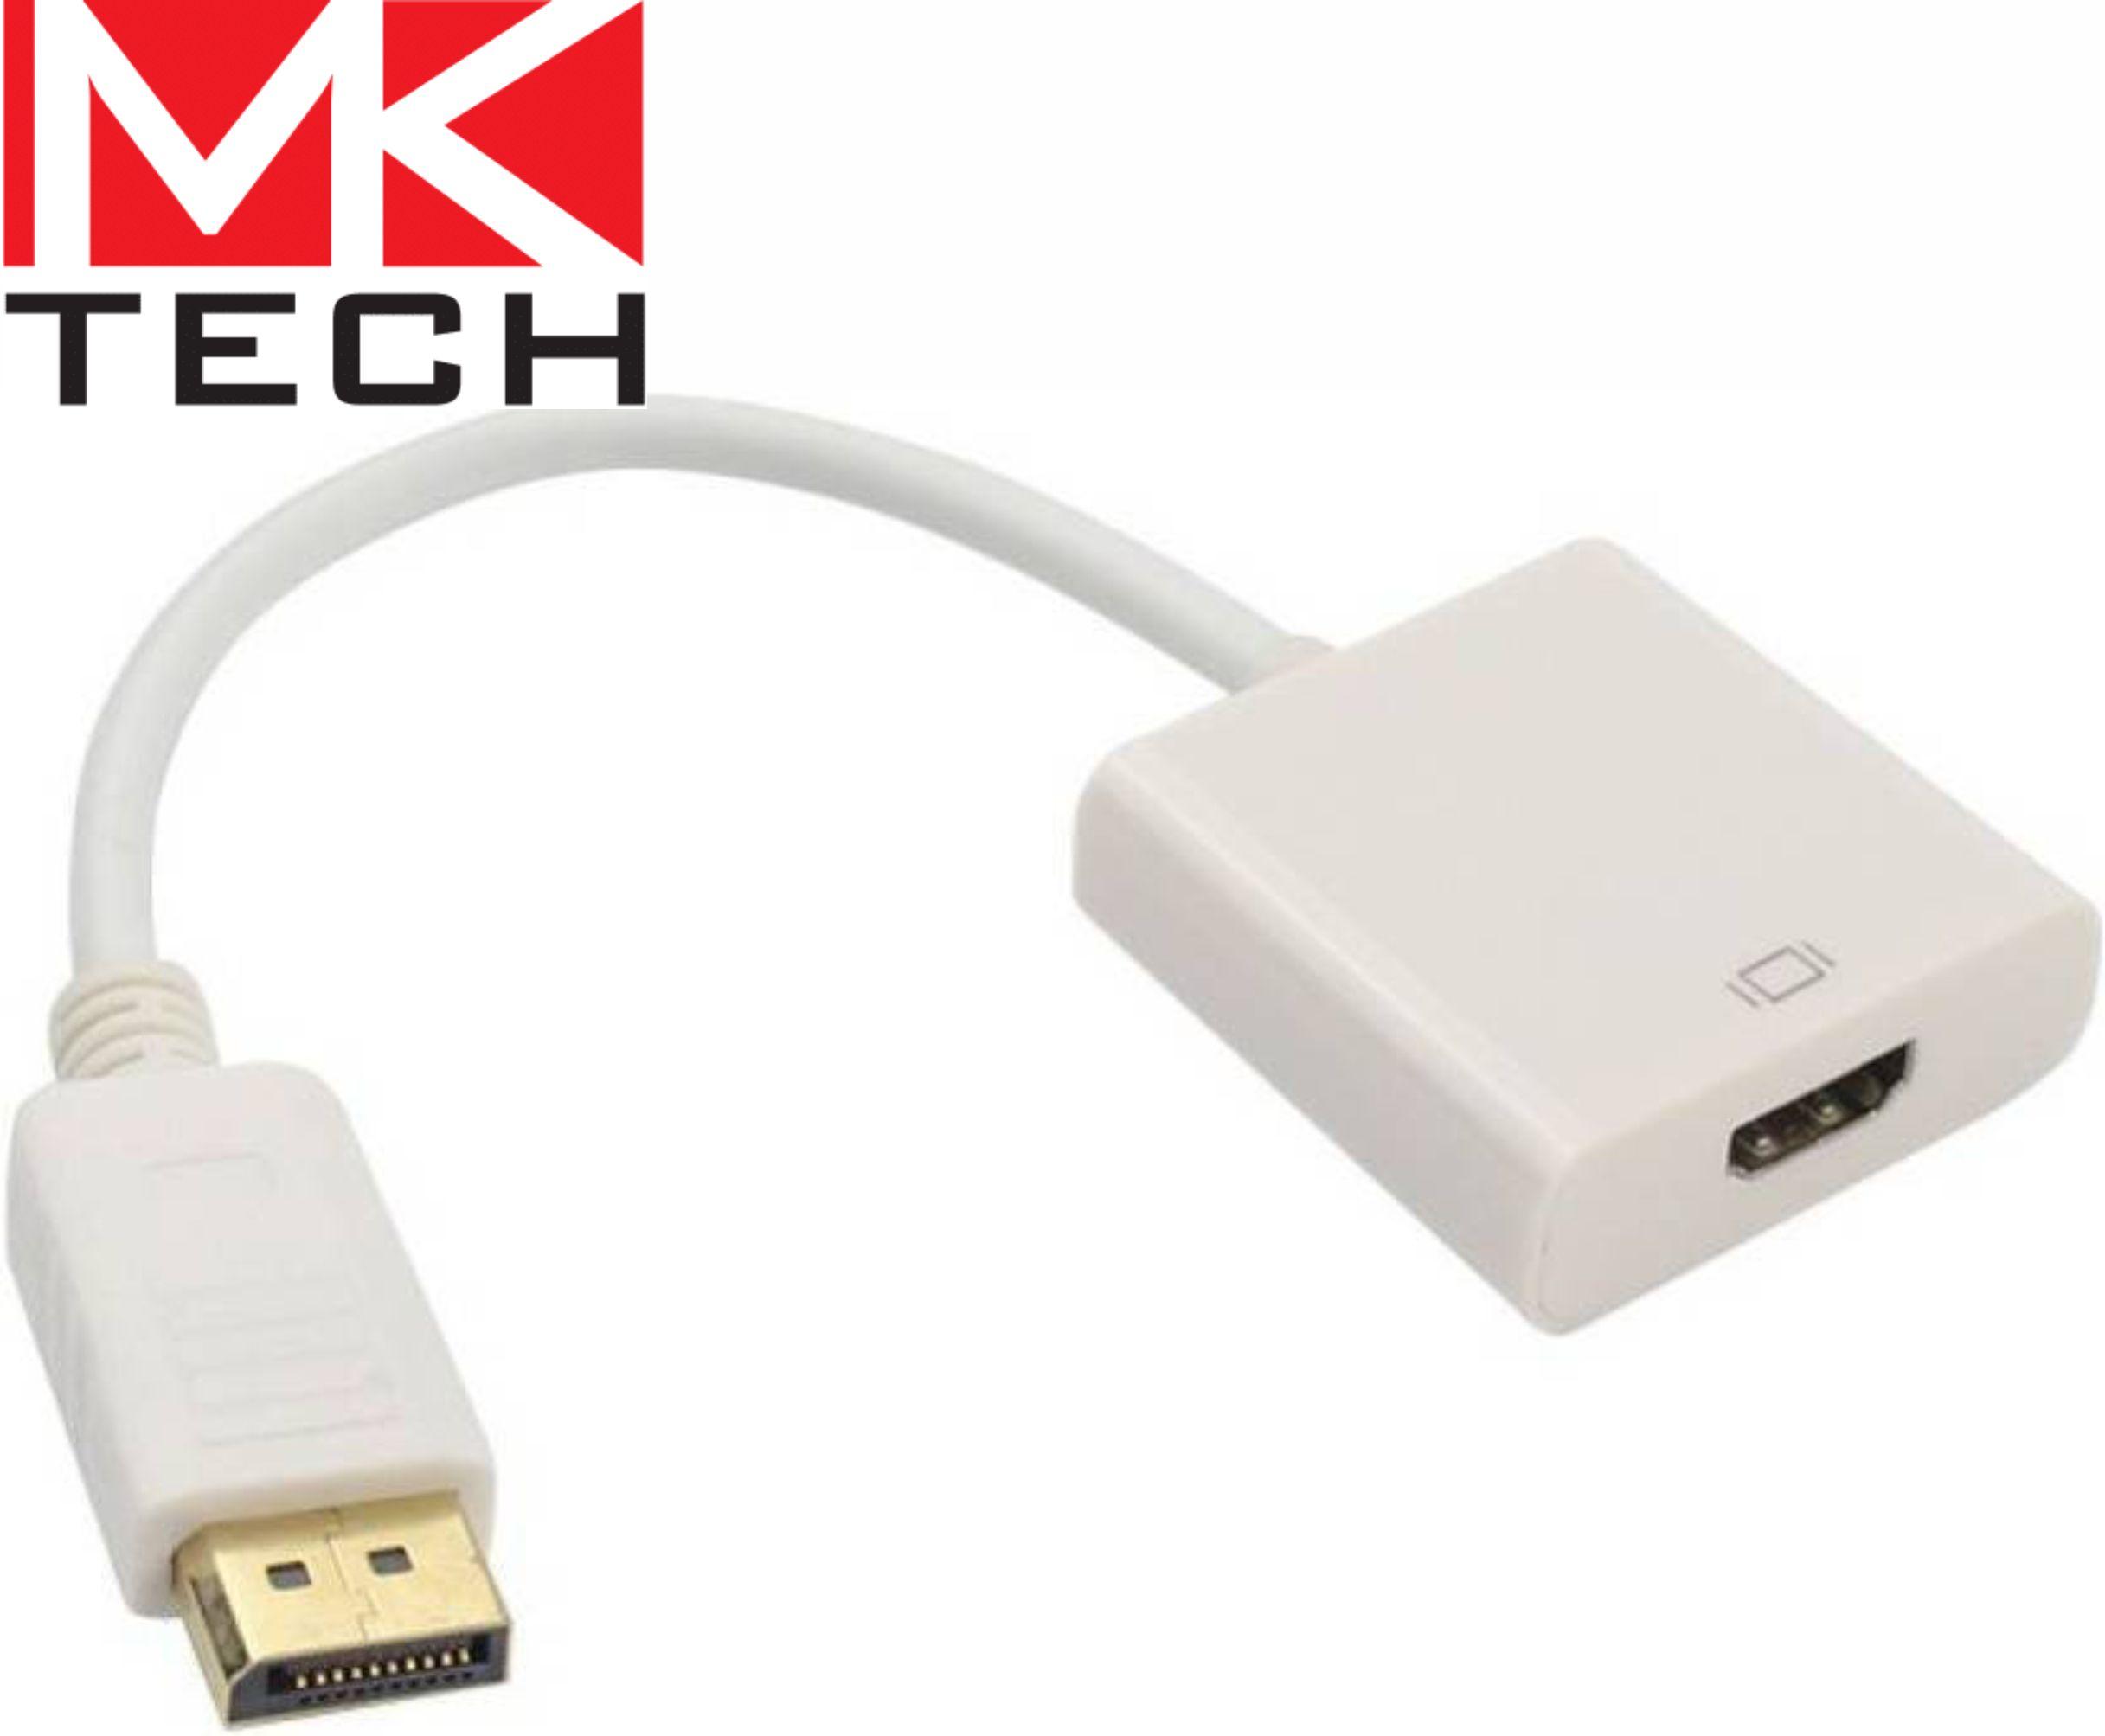 DisplayPort male to HDMI female, 0.1 m MKTECH